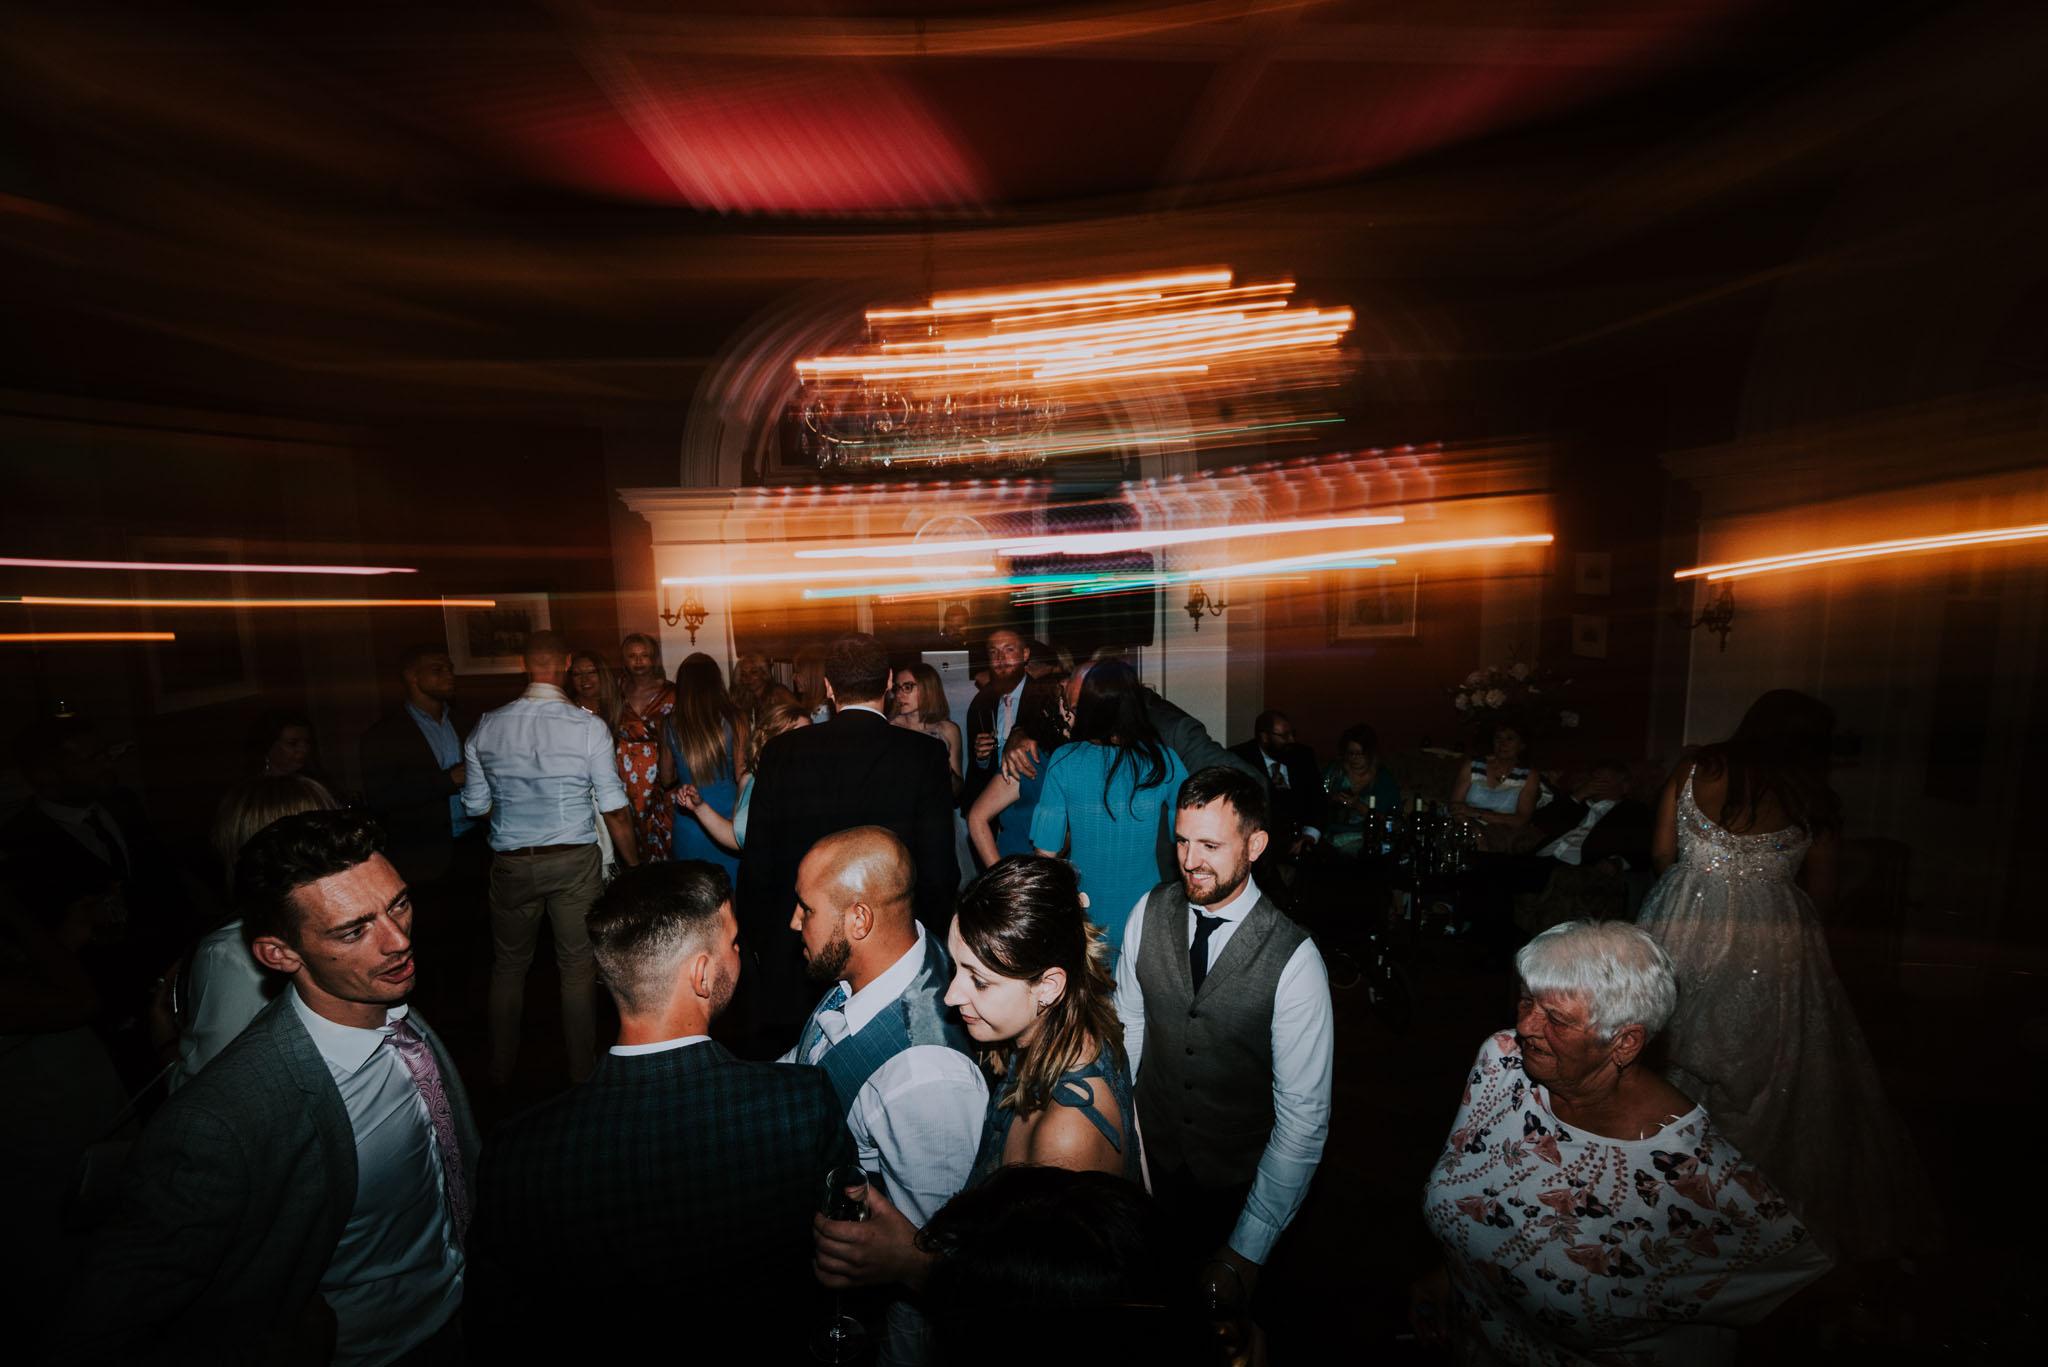 wedding-photographer-glewstone-court-hereford-scott-stockwell-photography493.jpg